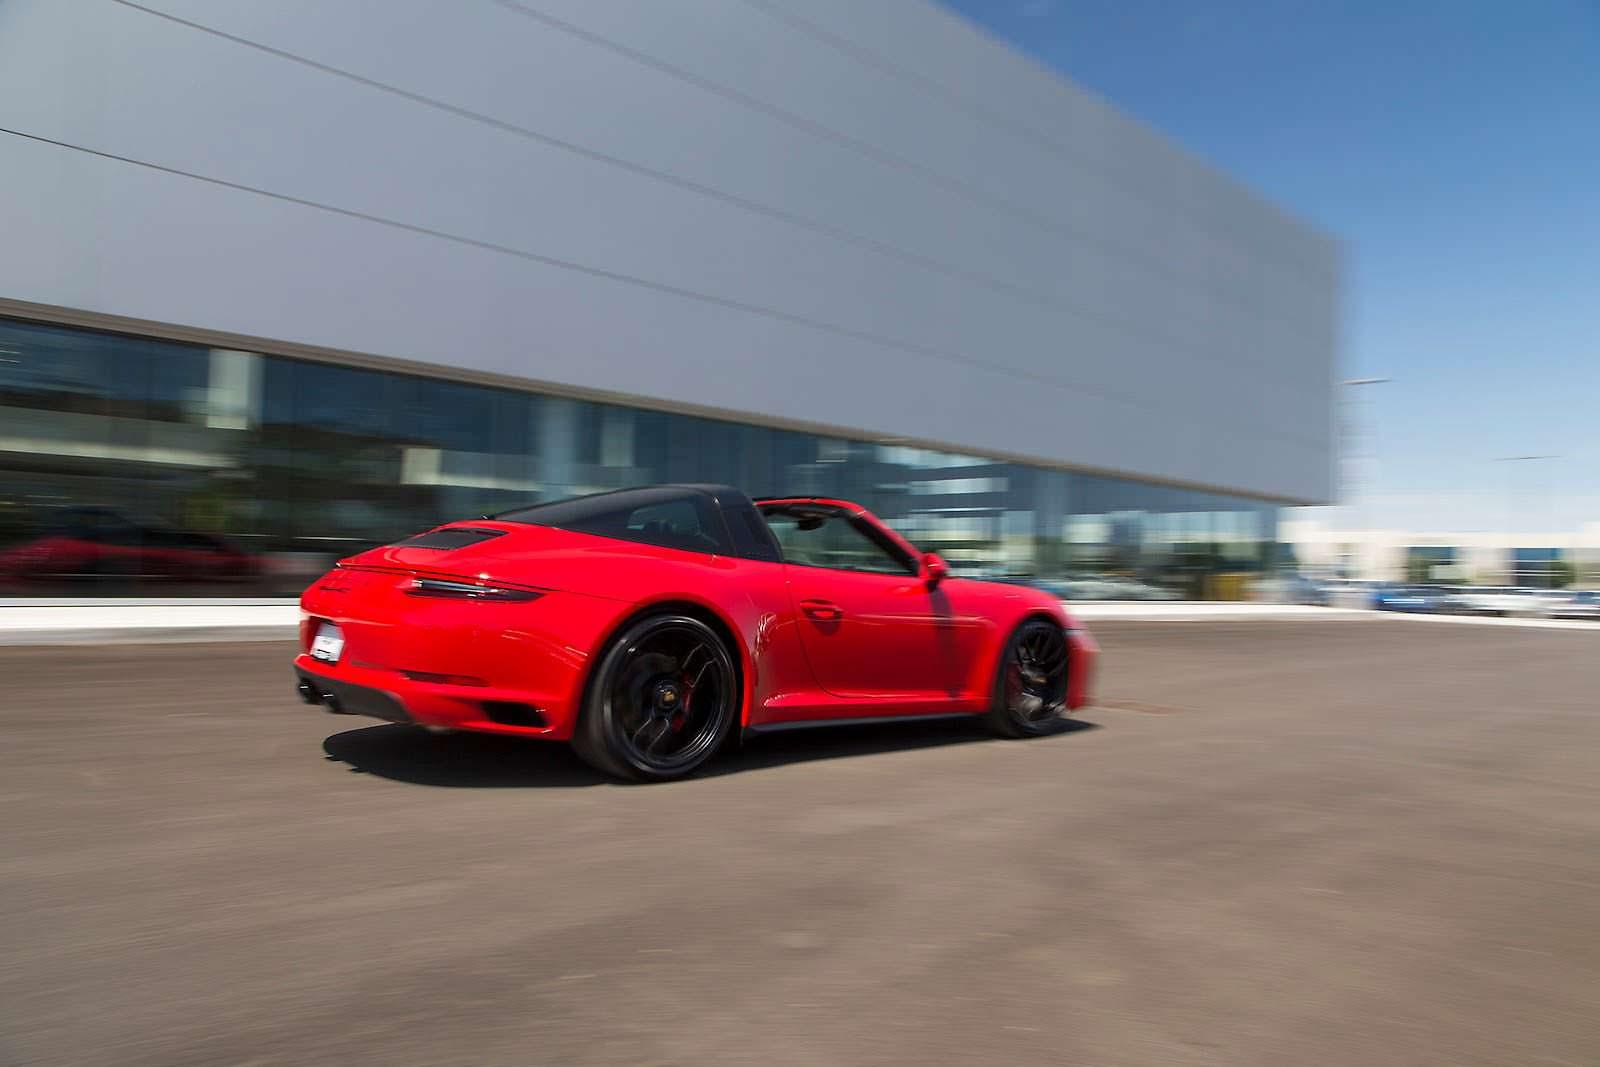 999999-я Porsche 911 Targa 4 GTS на дороге